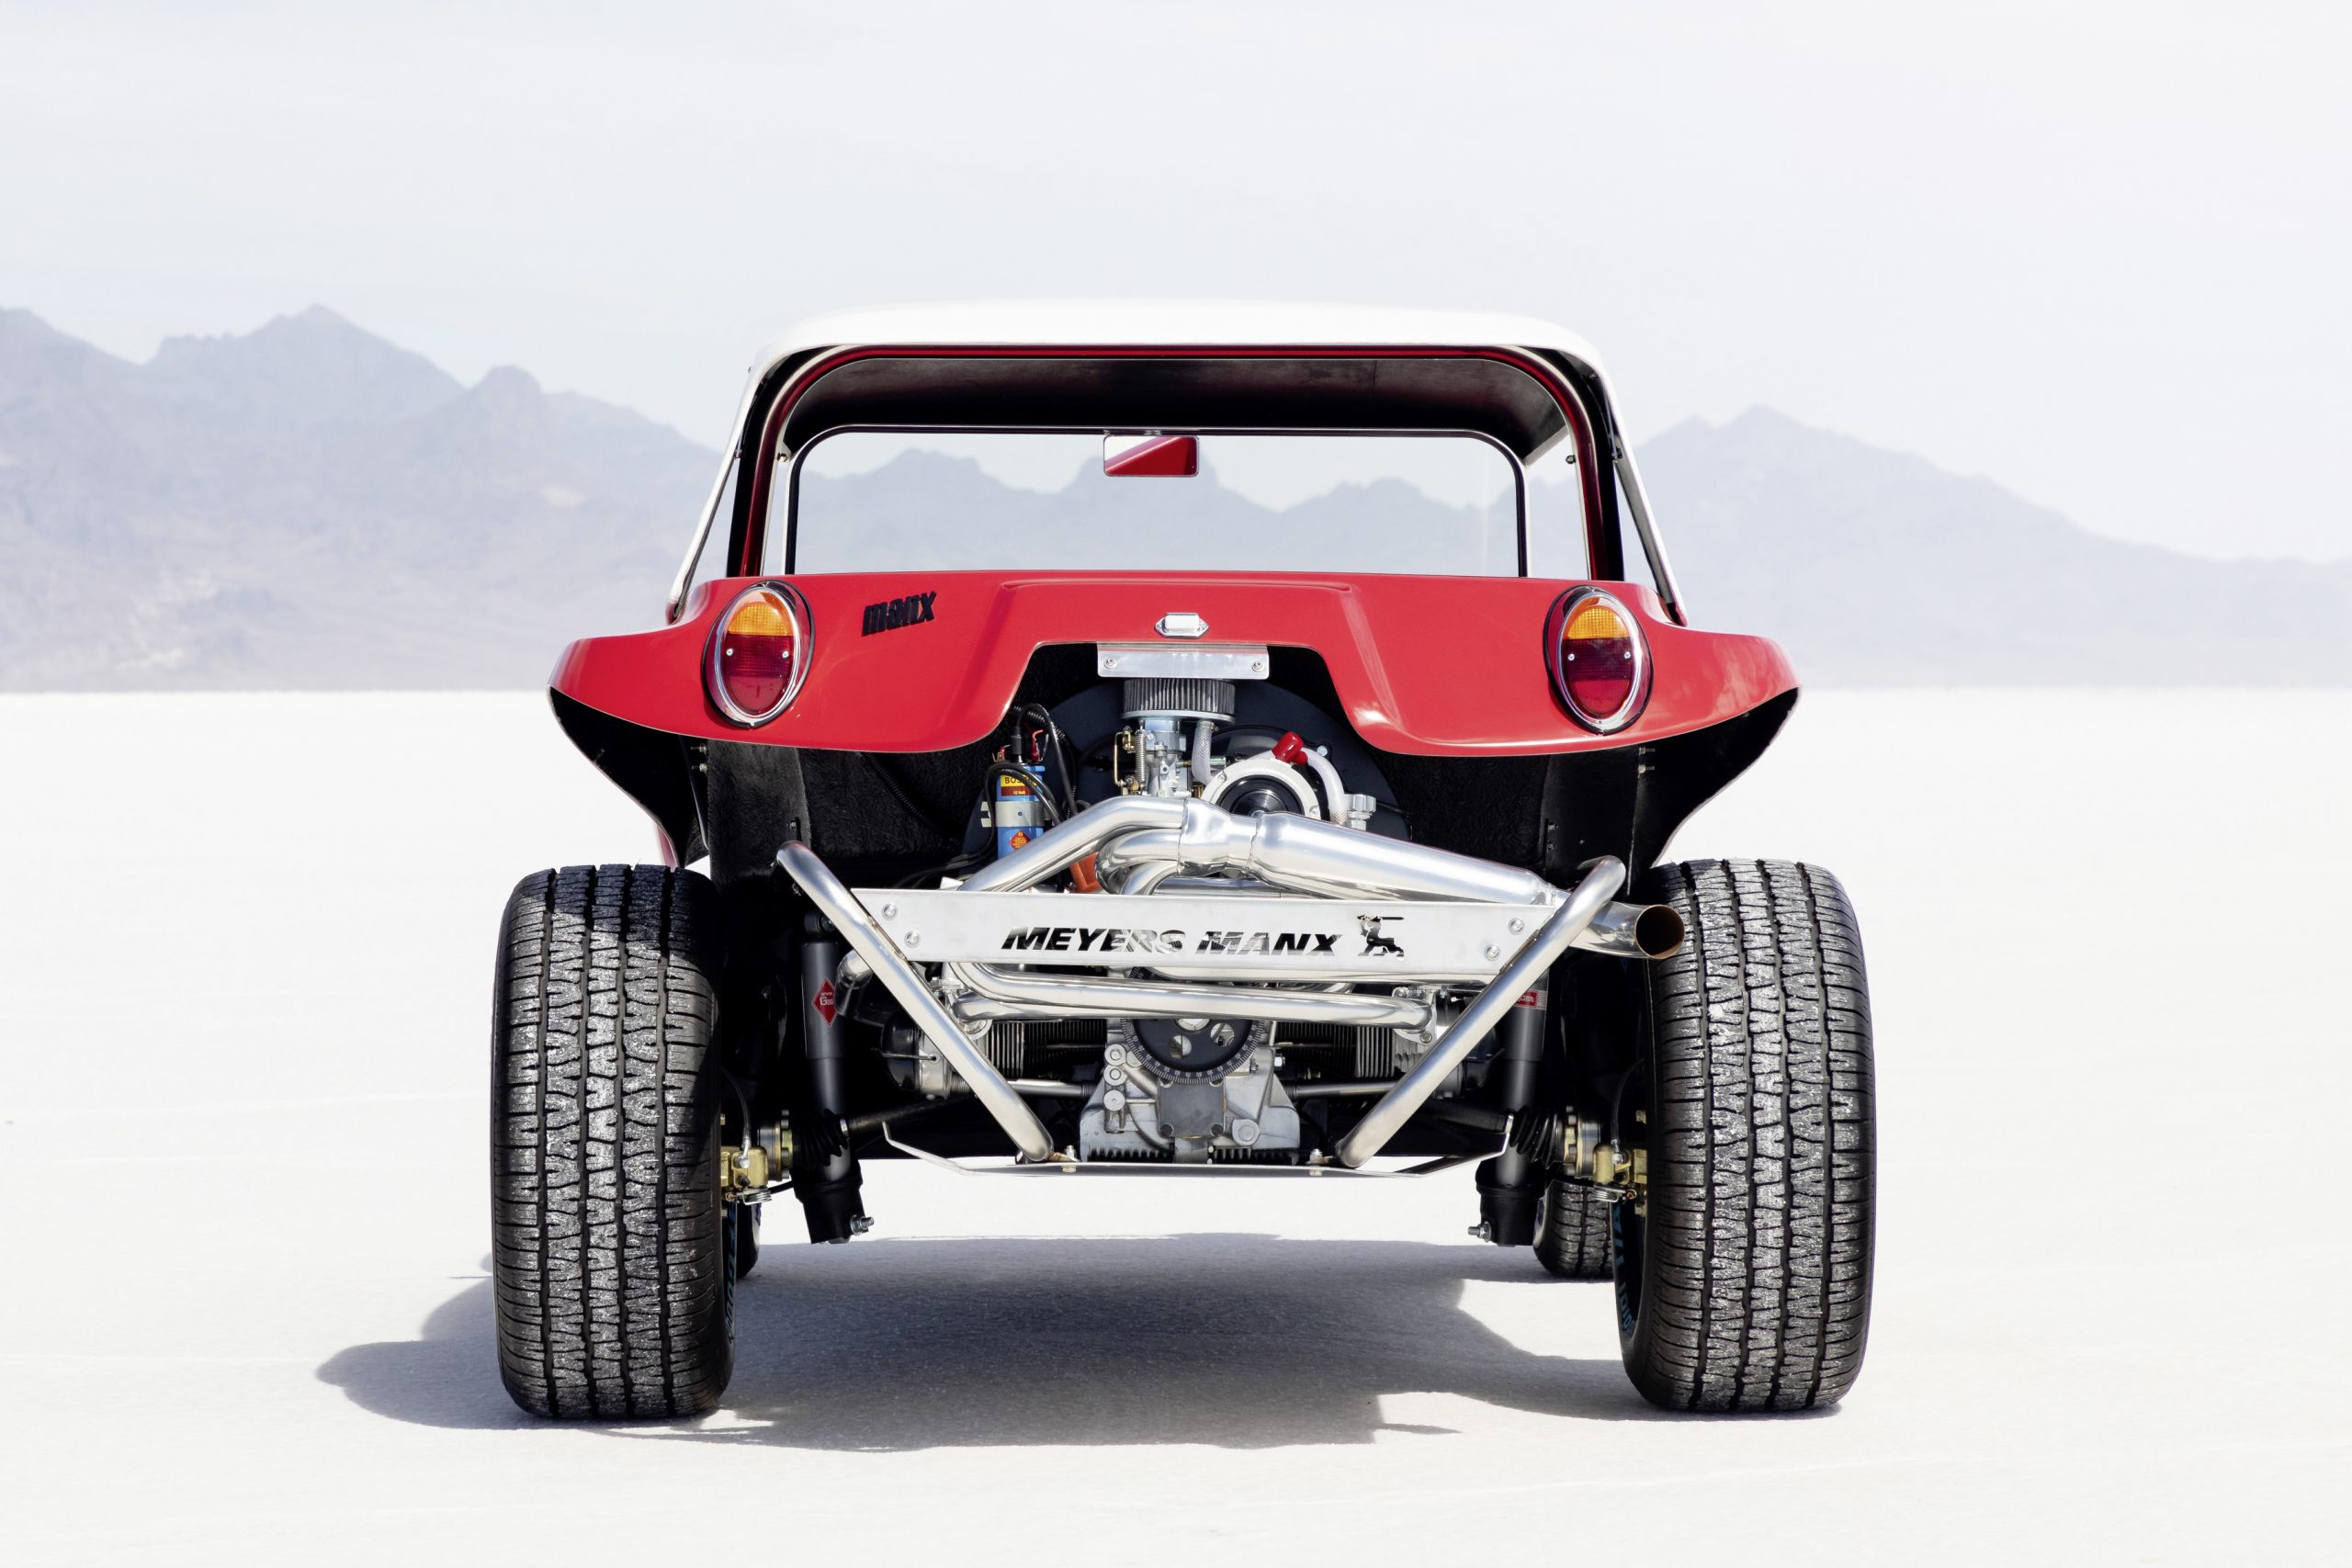 Meyers Manx Fiberglass Dune Buggy rear